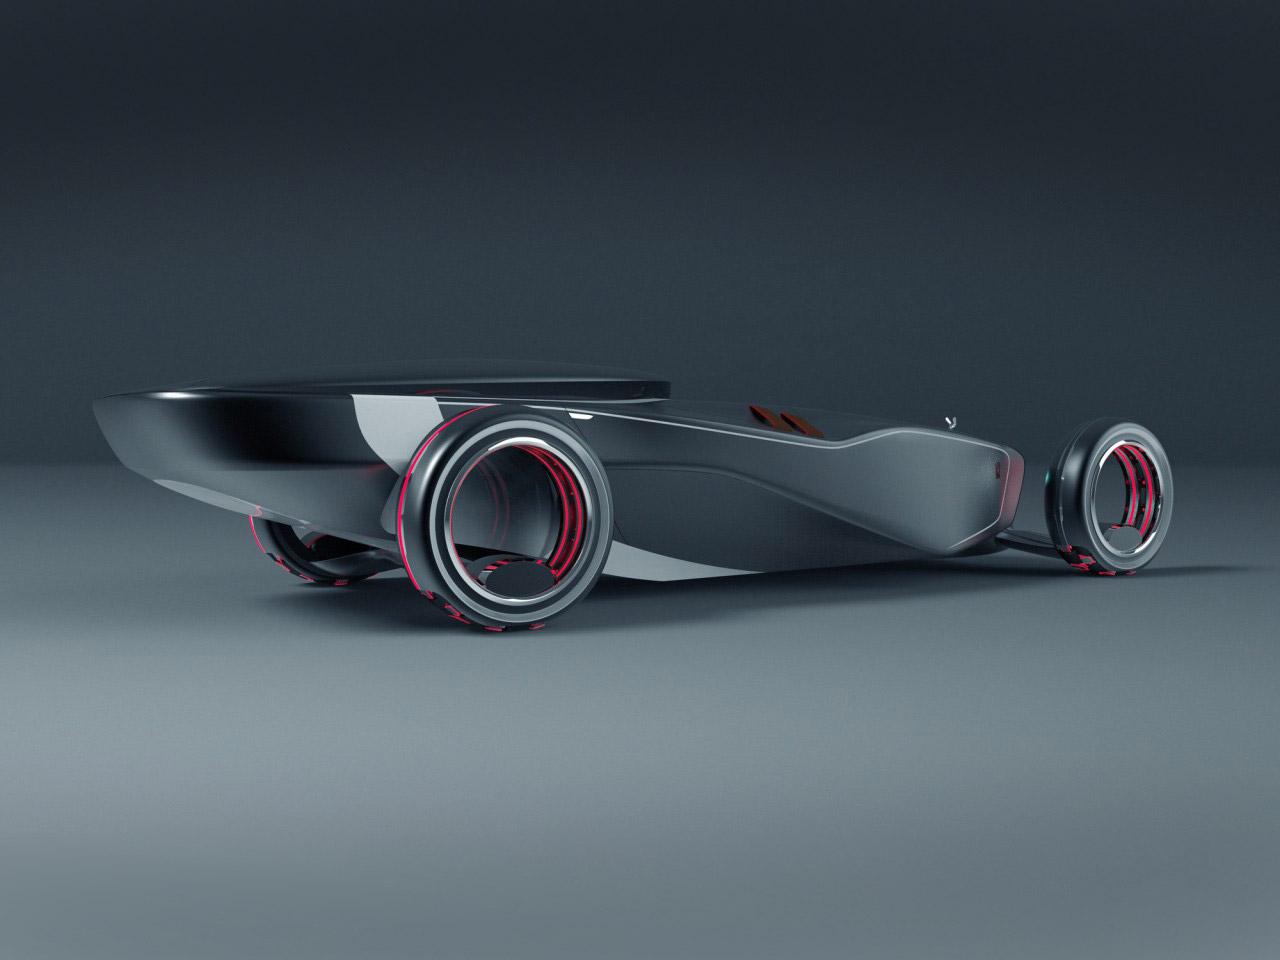 Rolls Royce Eidolon 2030 Concept Car Body Design